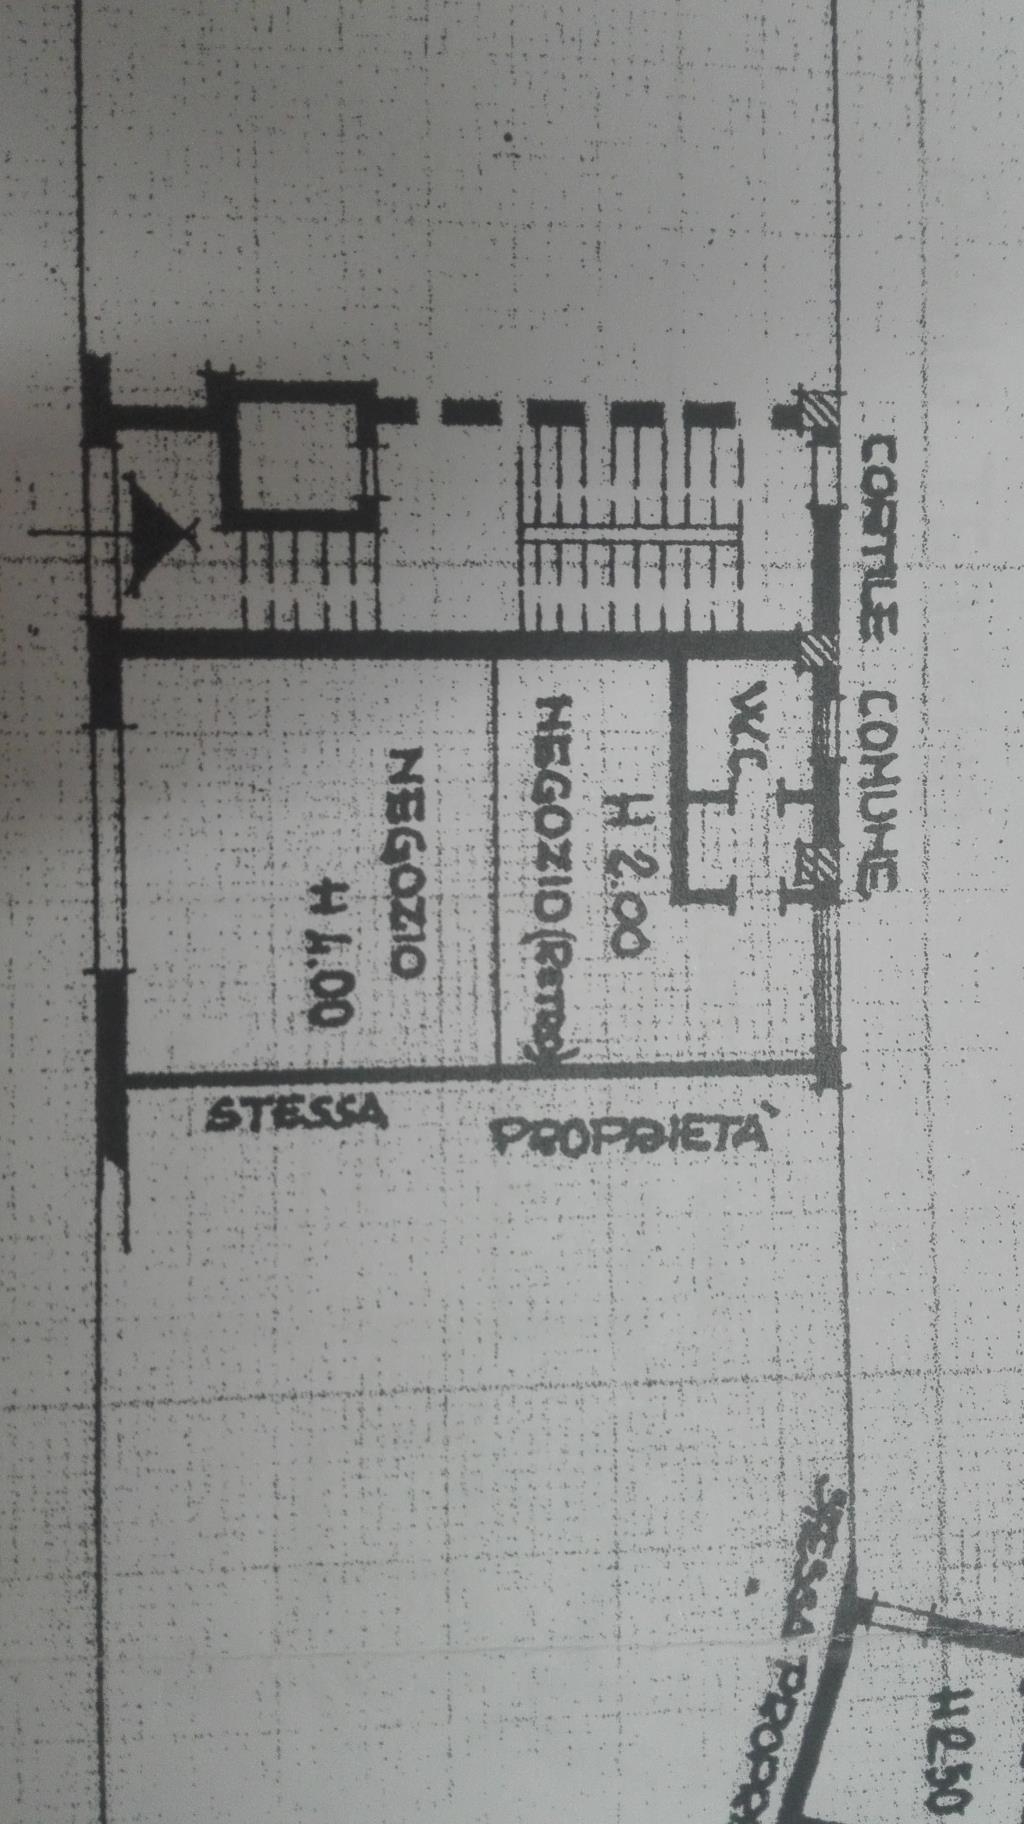 ravenna vendita quart: darsena fratelli-savorani-s.n.c.